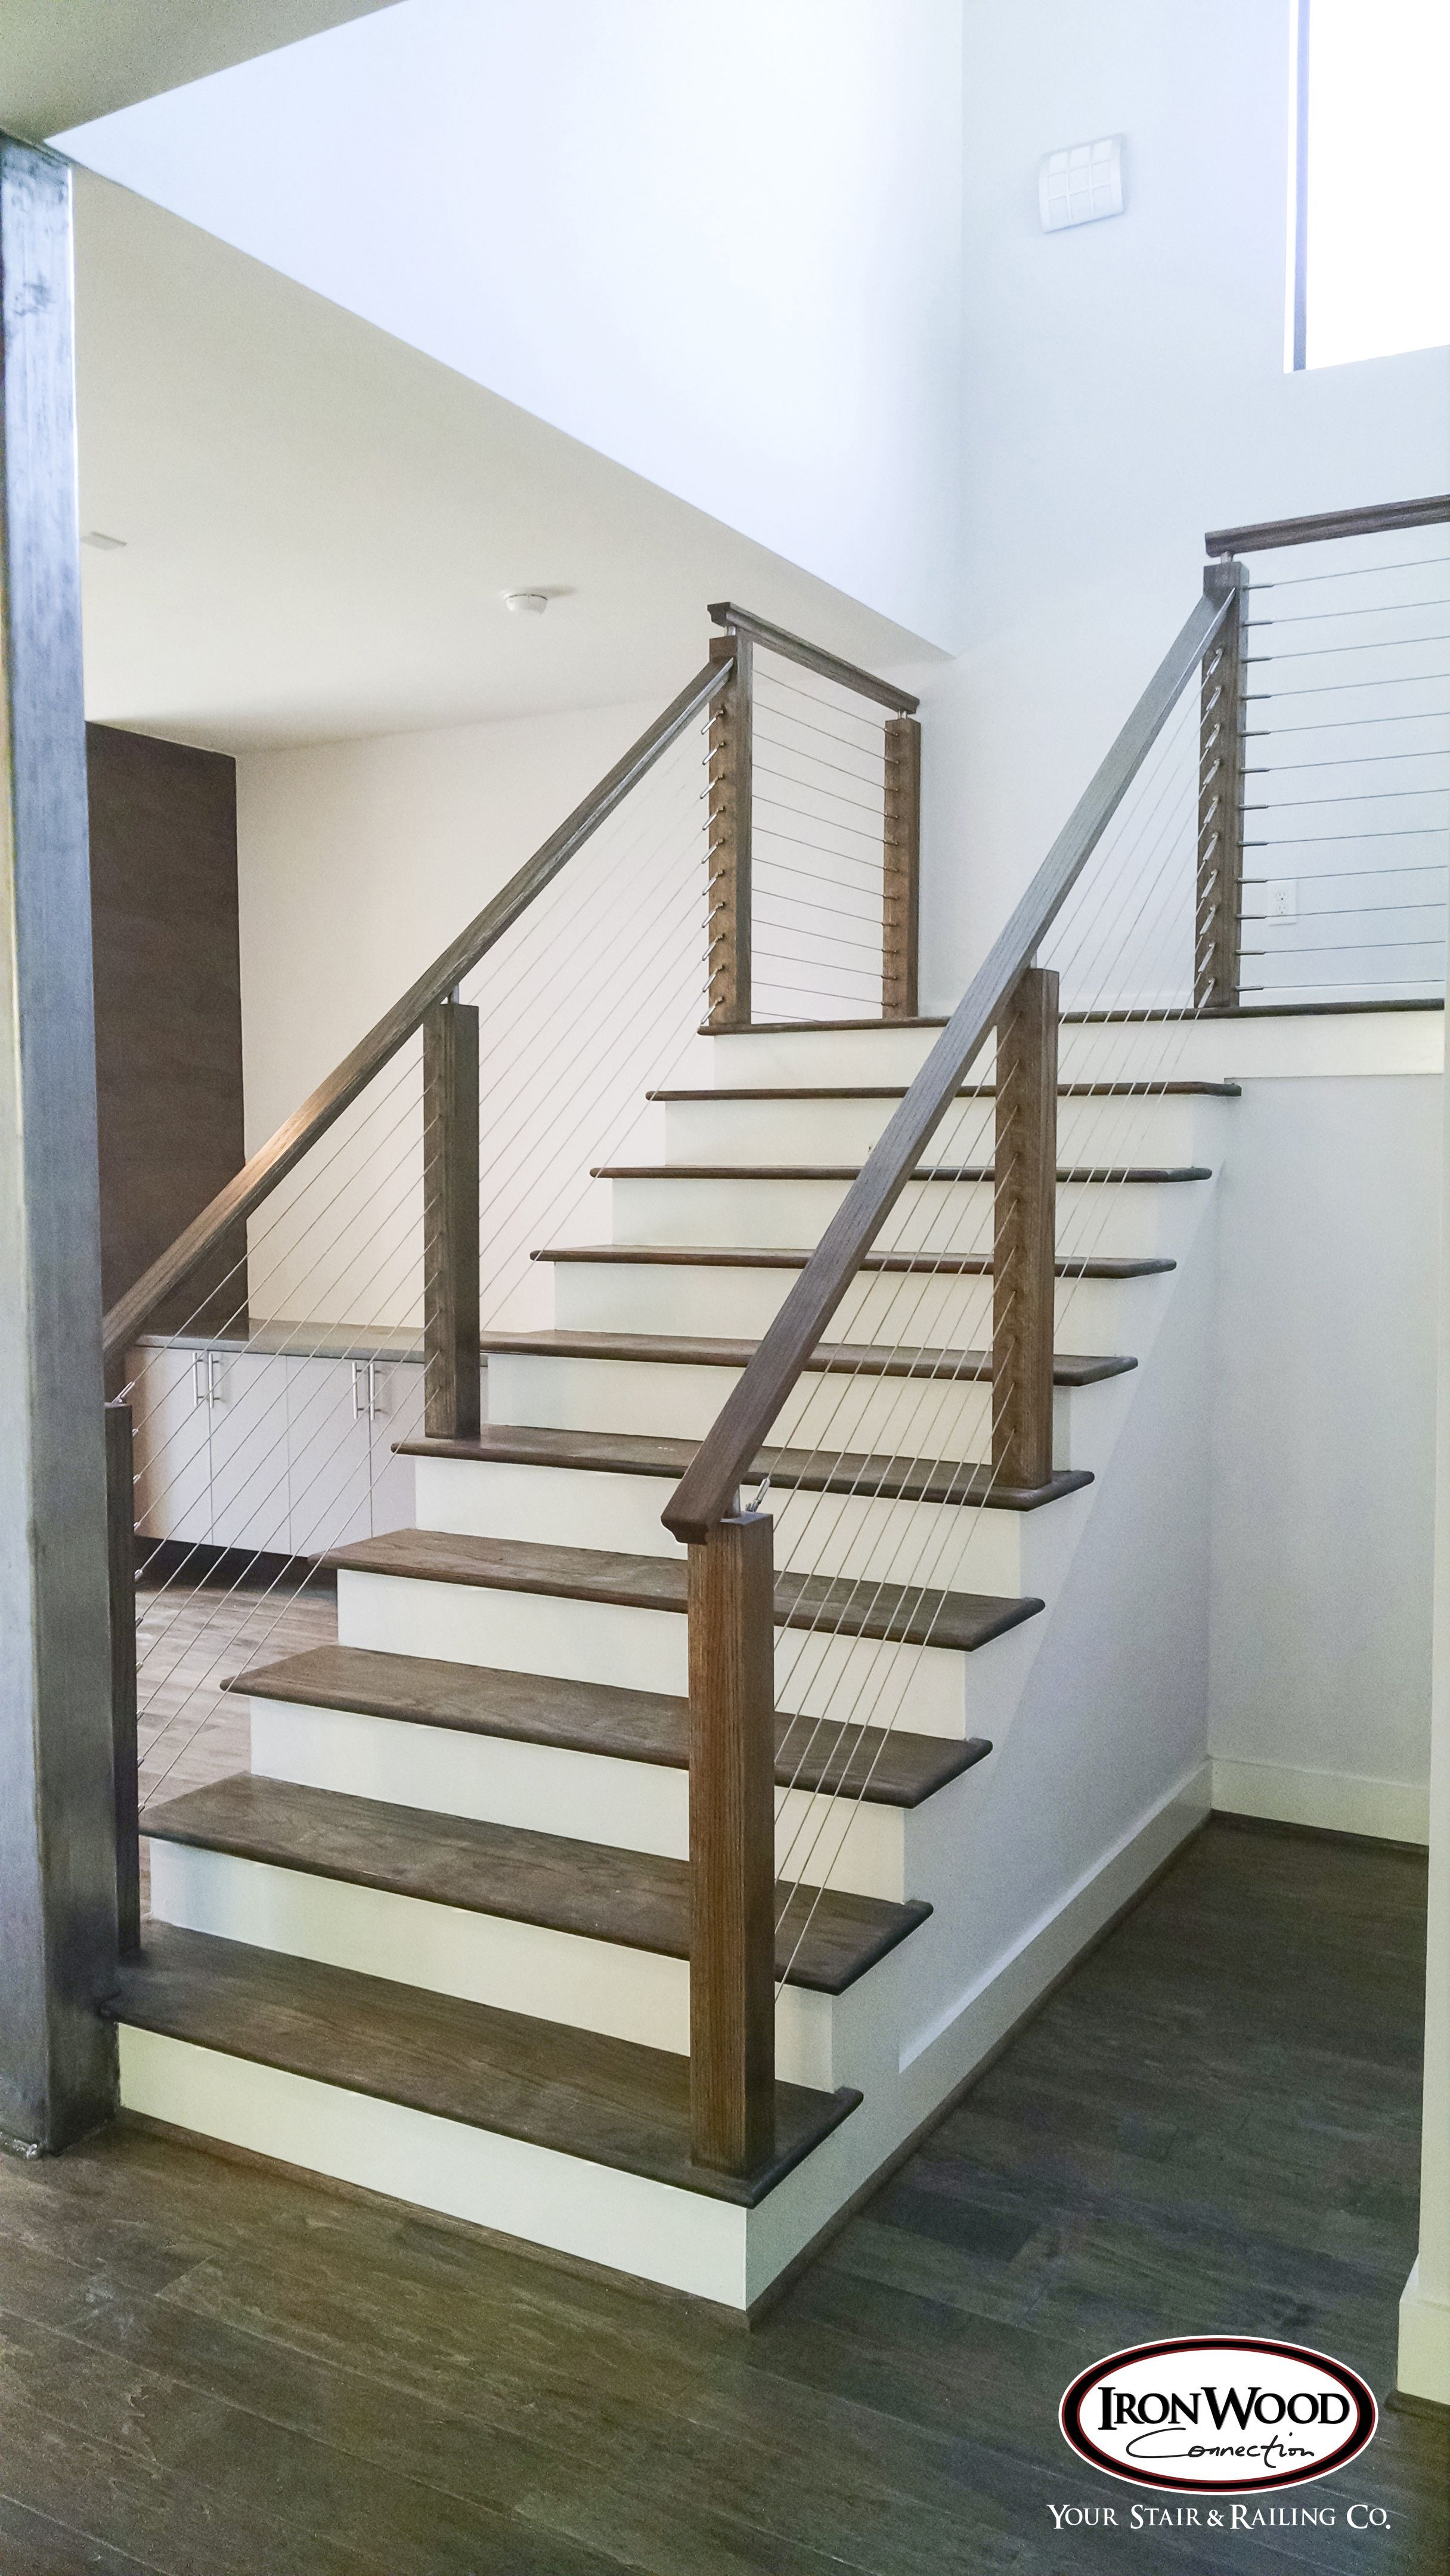 Cable Railing Diy Stair Railing Stair Railing Kits | Cable Stair Railing Diy